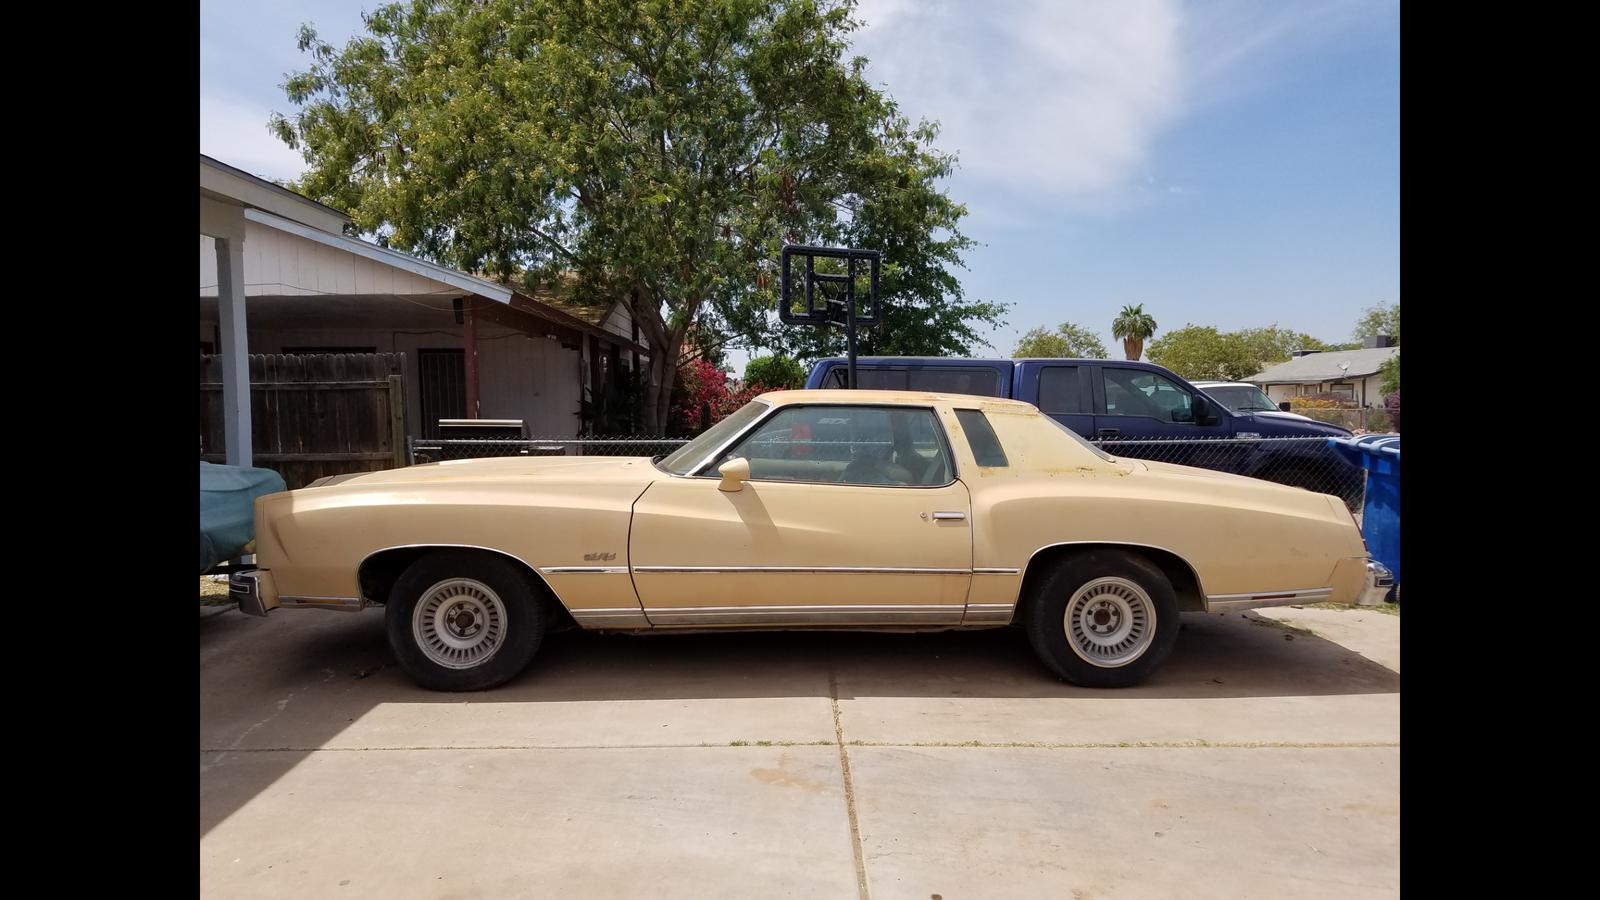 1976 Chevrolet Monte Carlo - Overview - CarGurus